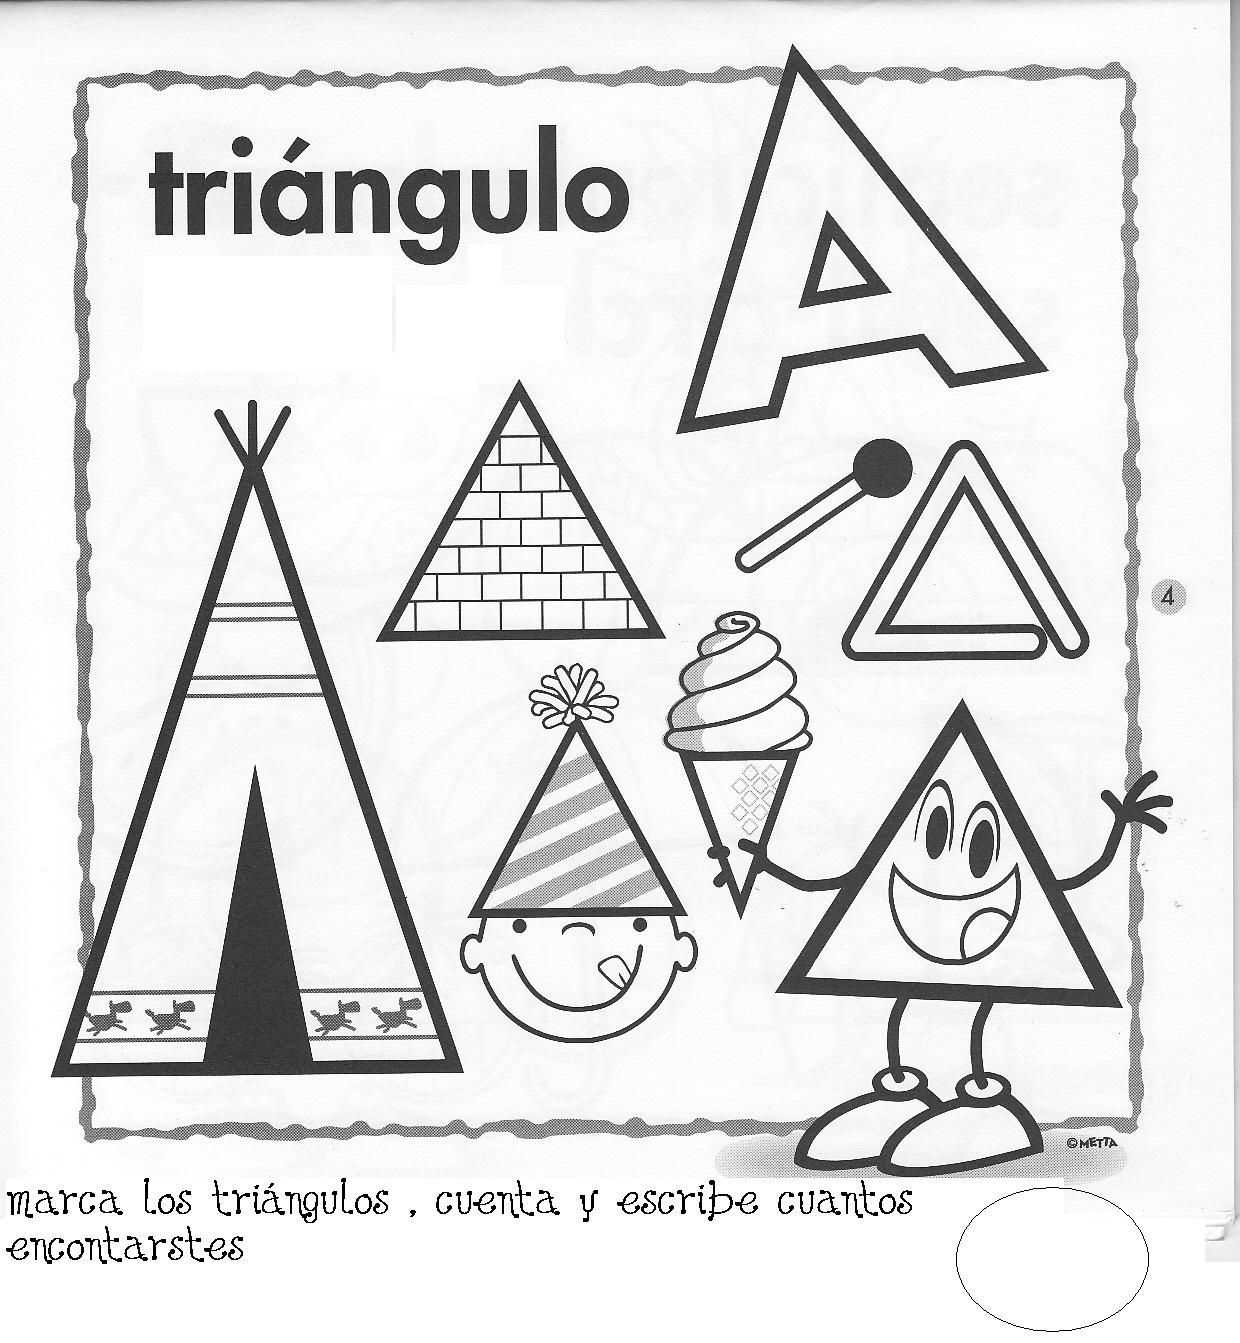 Fichas para pintar: Fichas figuras geometricas Fichas de figuras ...